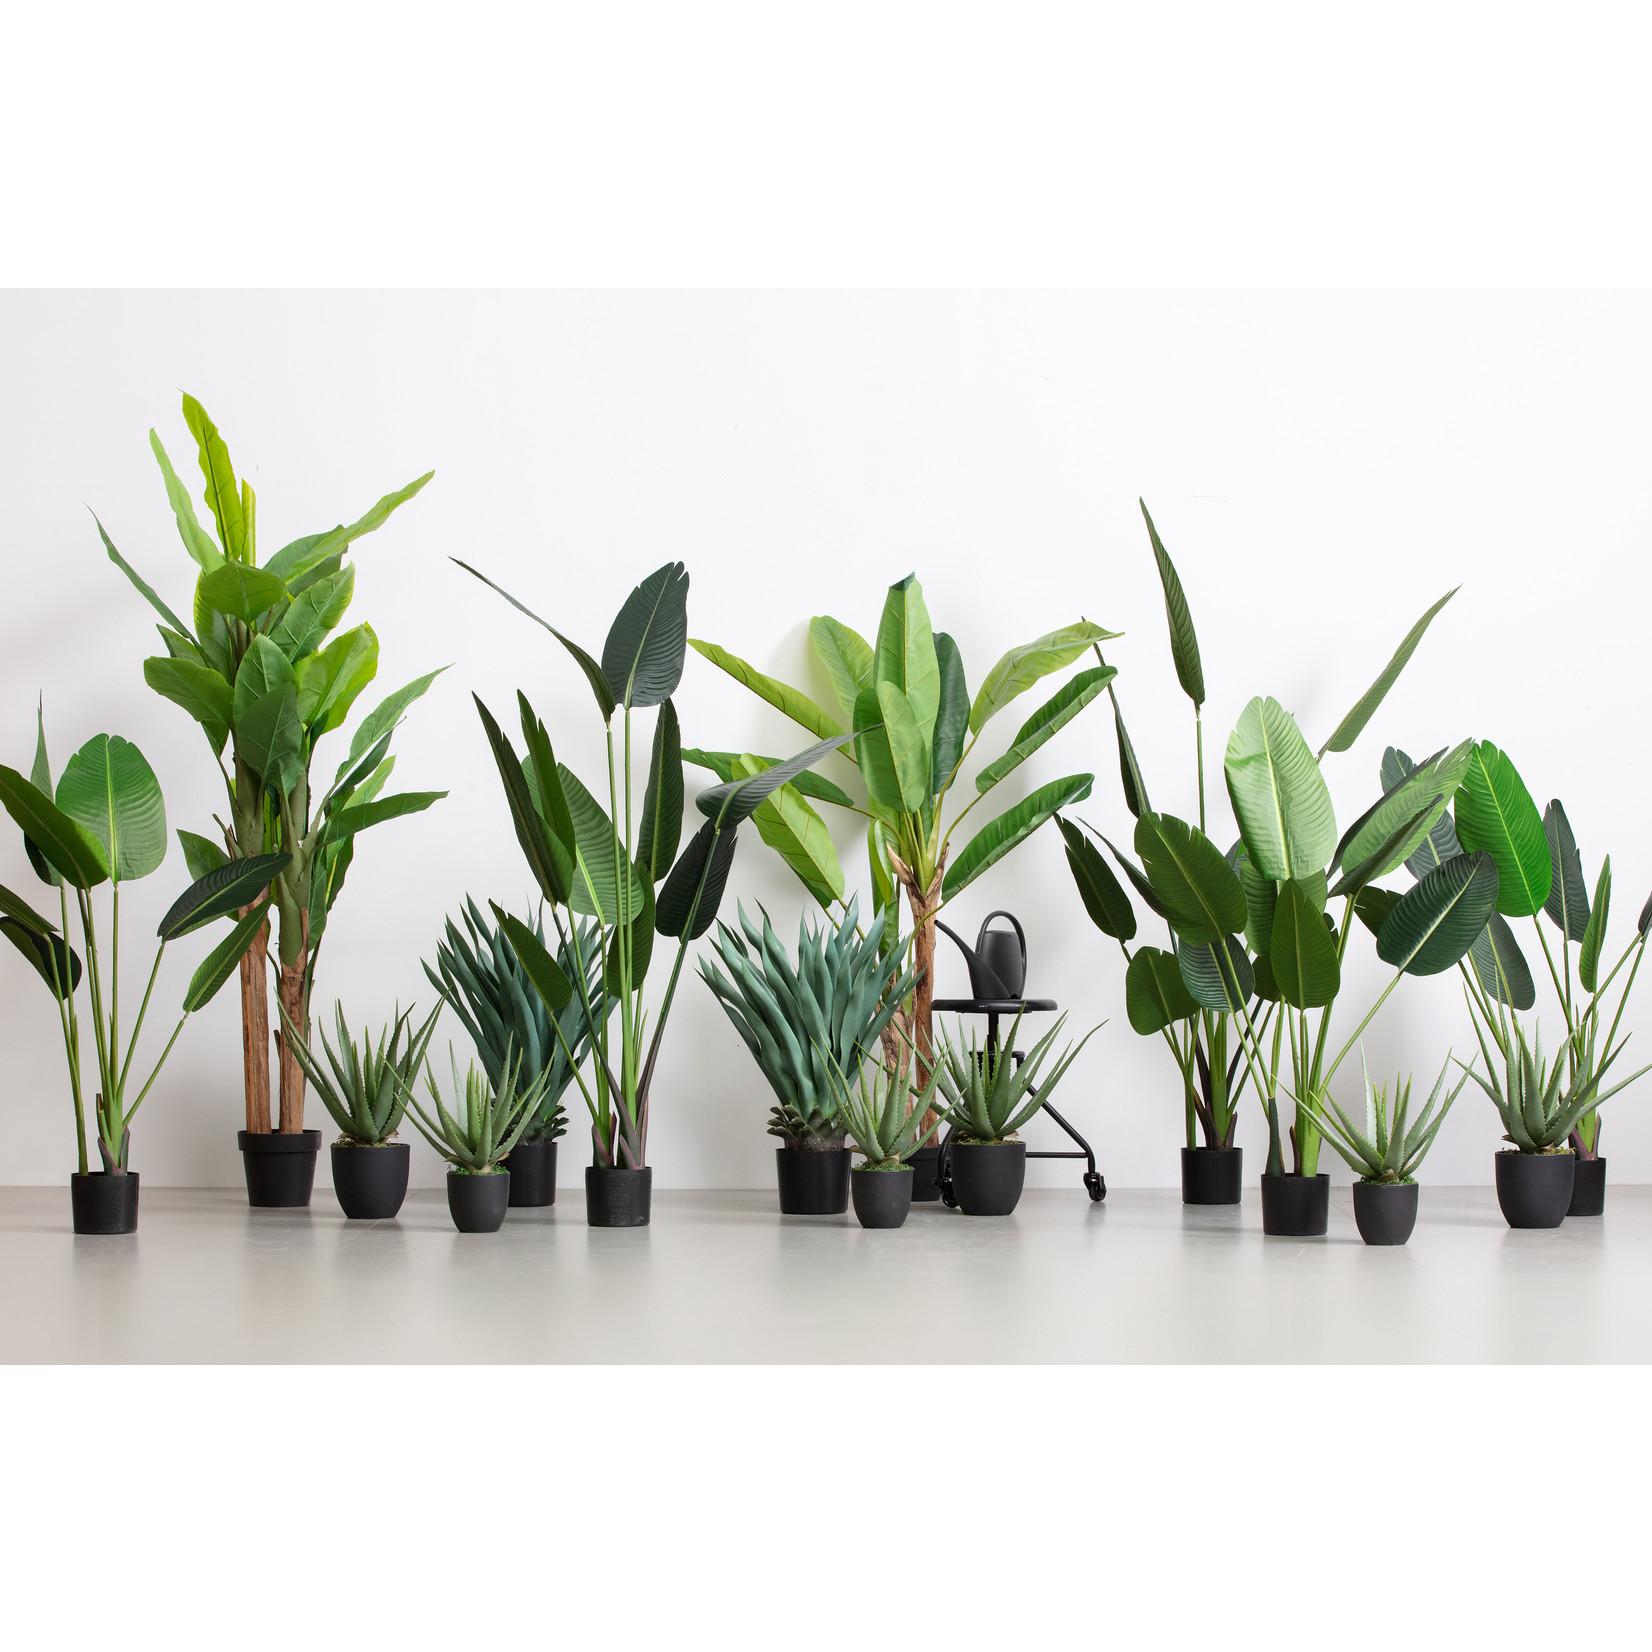 Woood Bananenplant Kunstplant Groen 195cm